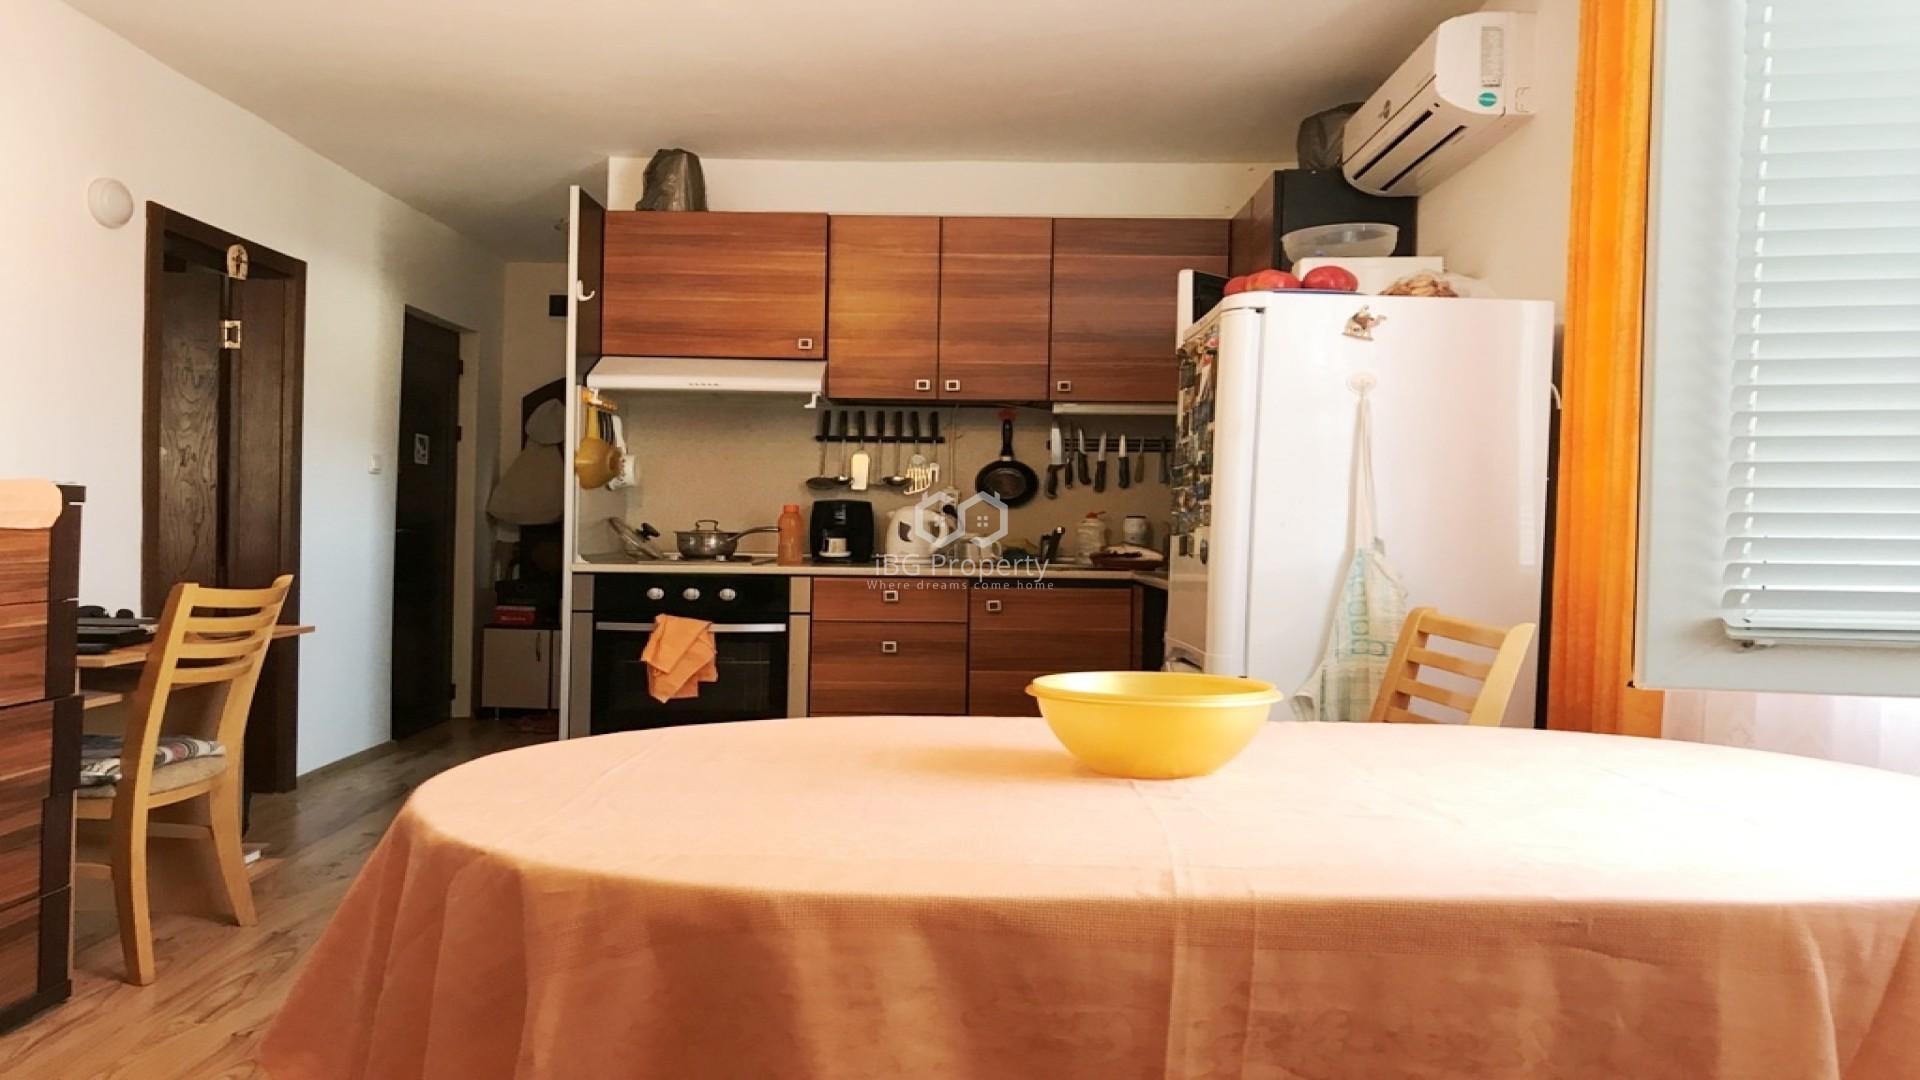 Двухкомнатная квартира Свети Влас 55 m2